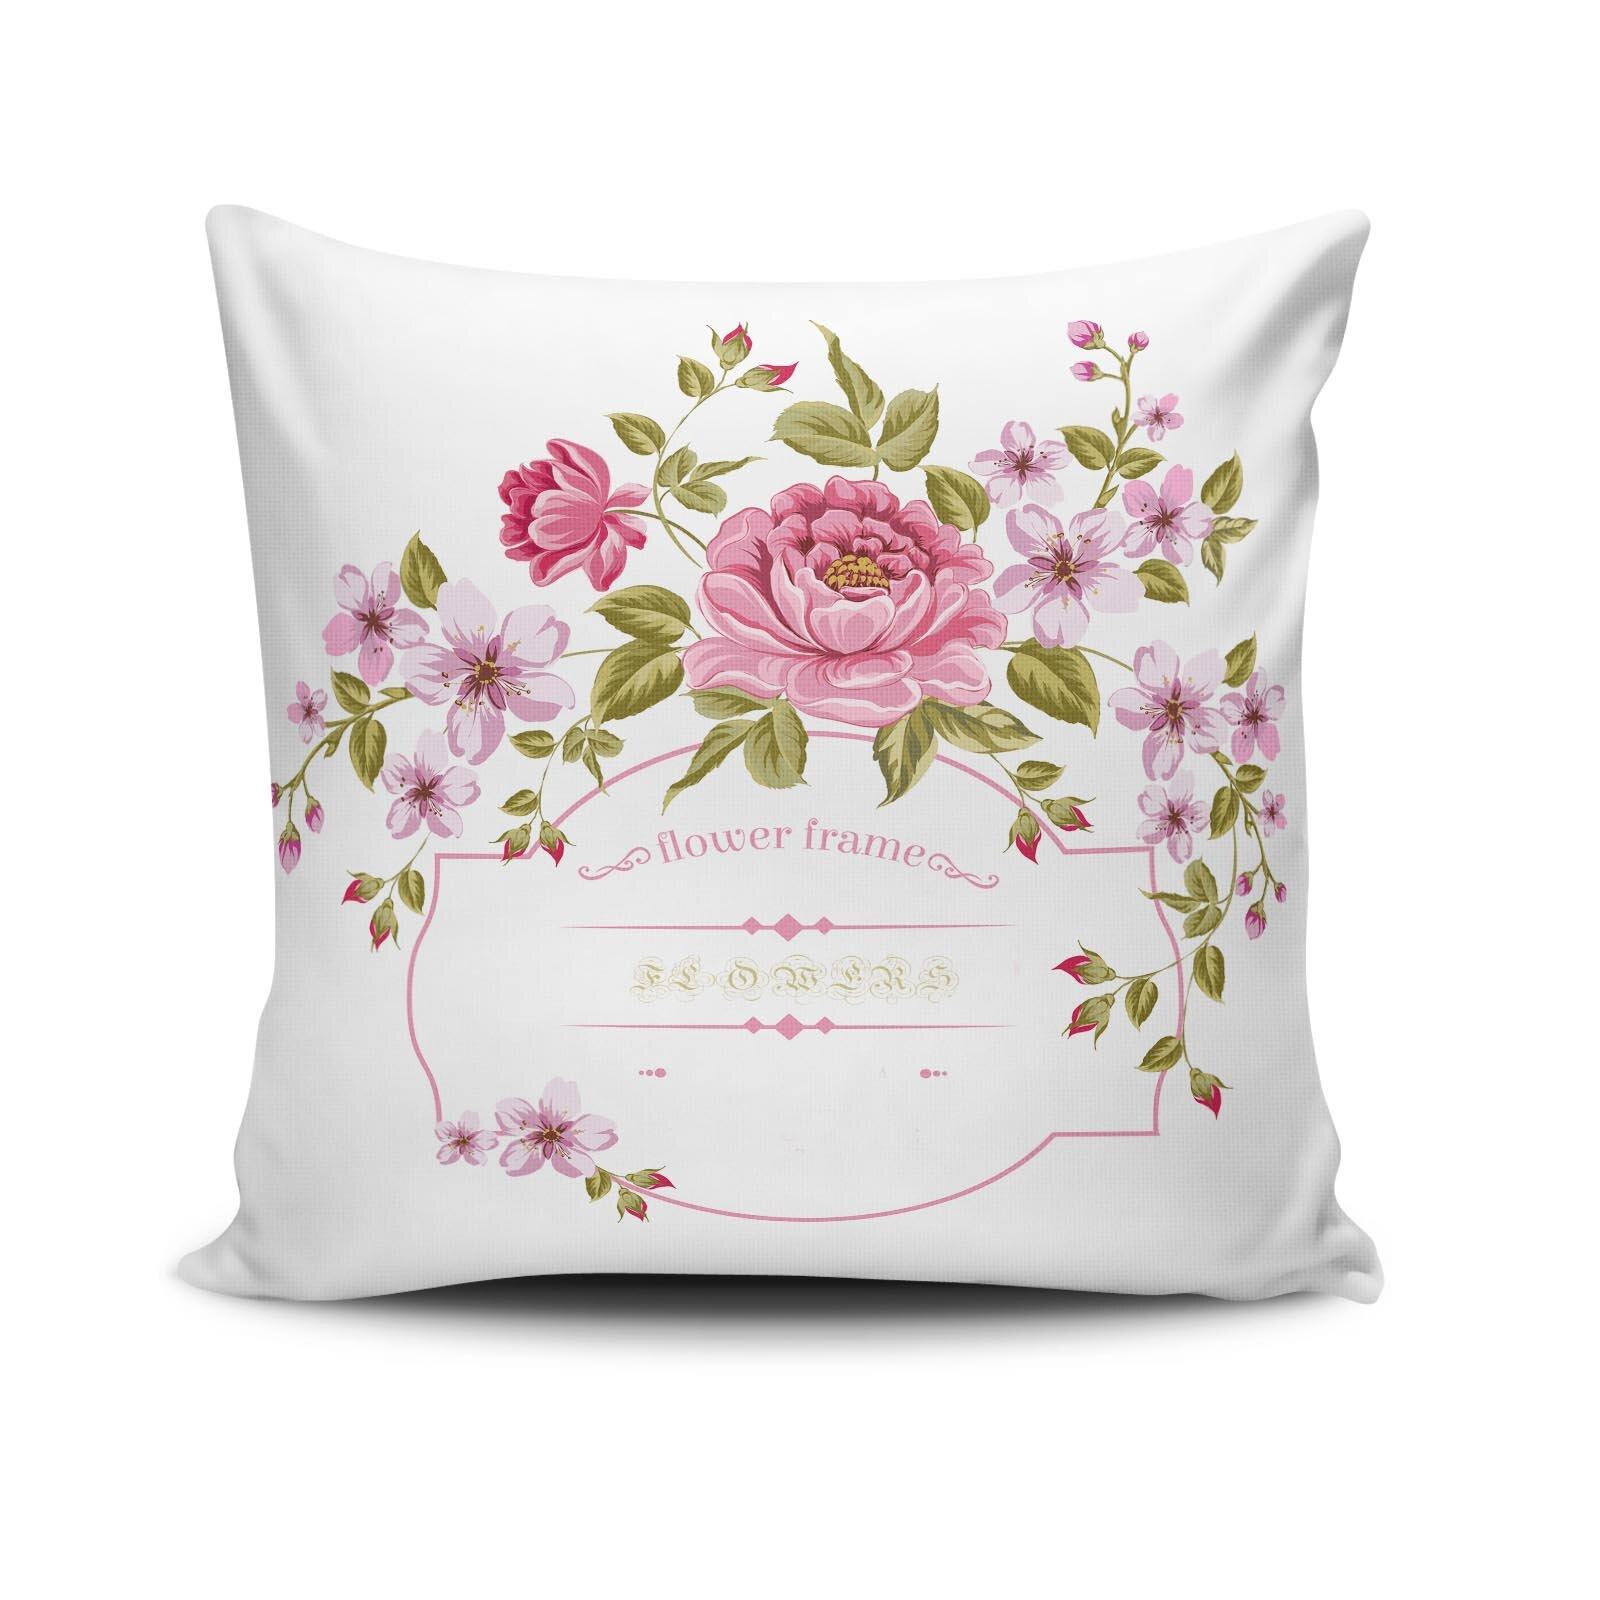 Perna decorativa Cushion Love, Dimensiune: 45 x 45 cm, Material exterior: 50% bumbac / 50% poliester 768CLV0228